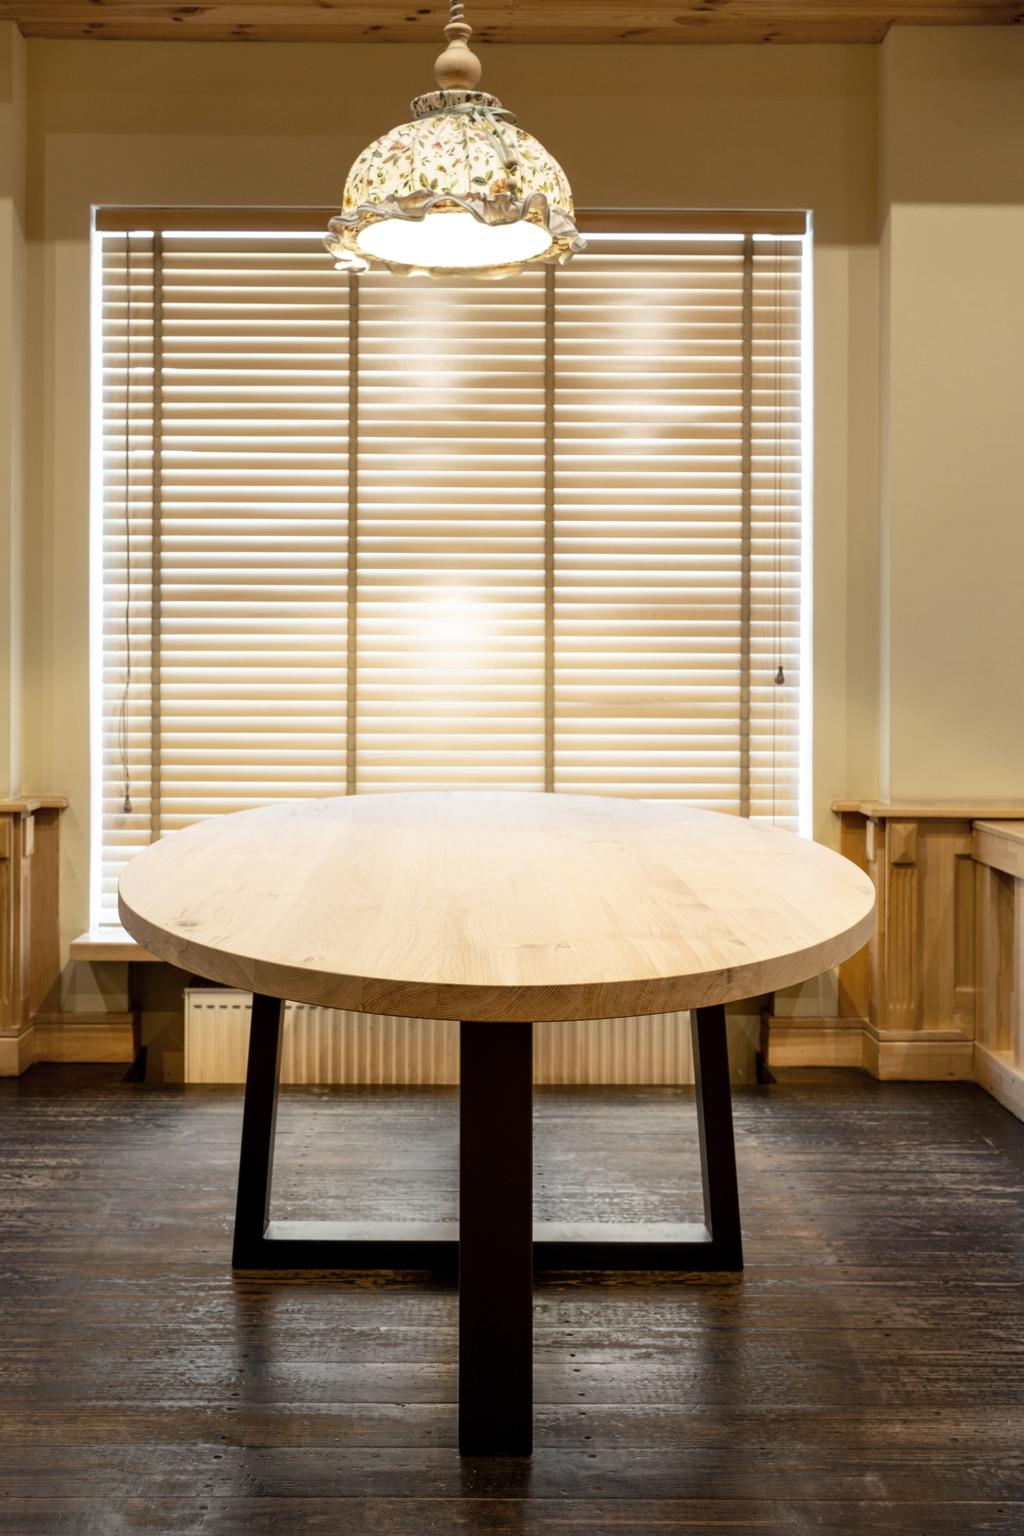 alleen ronde tafelbladen